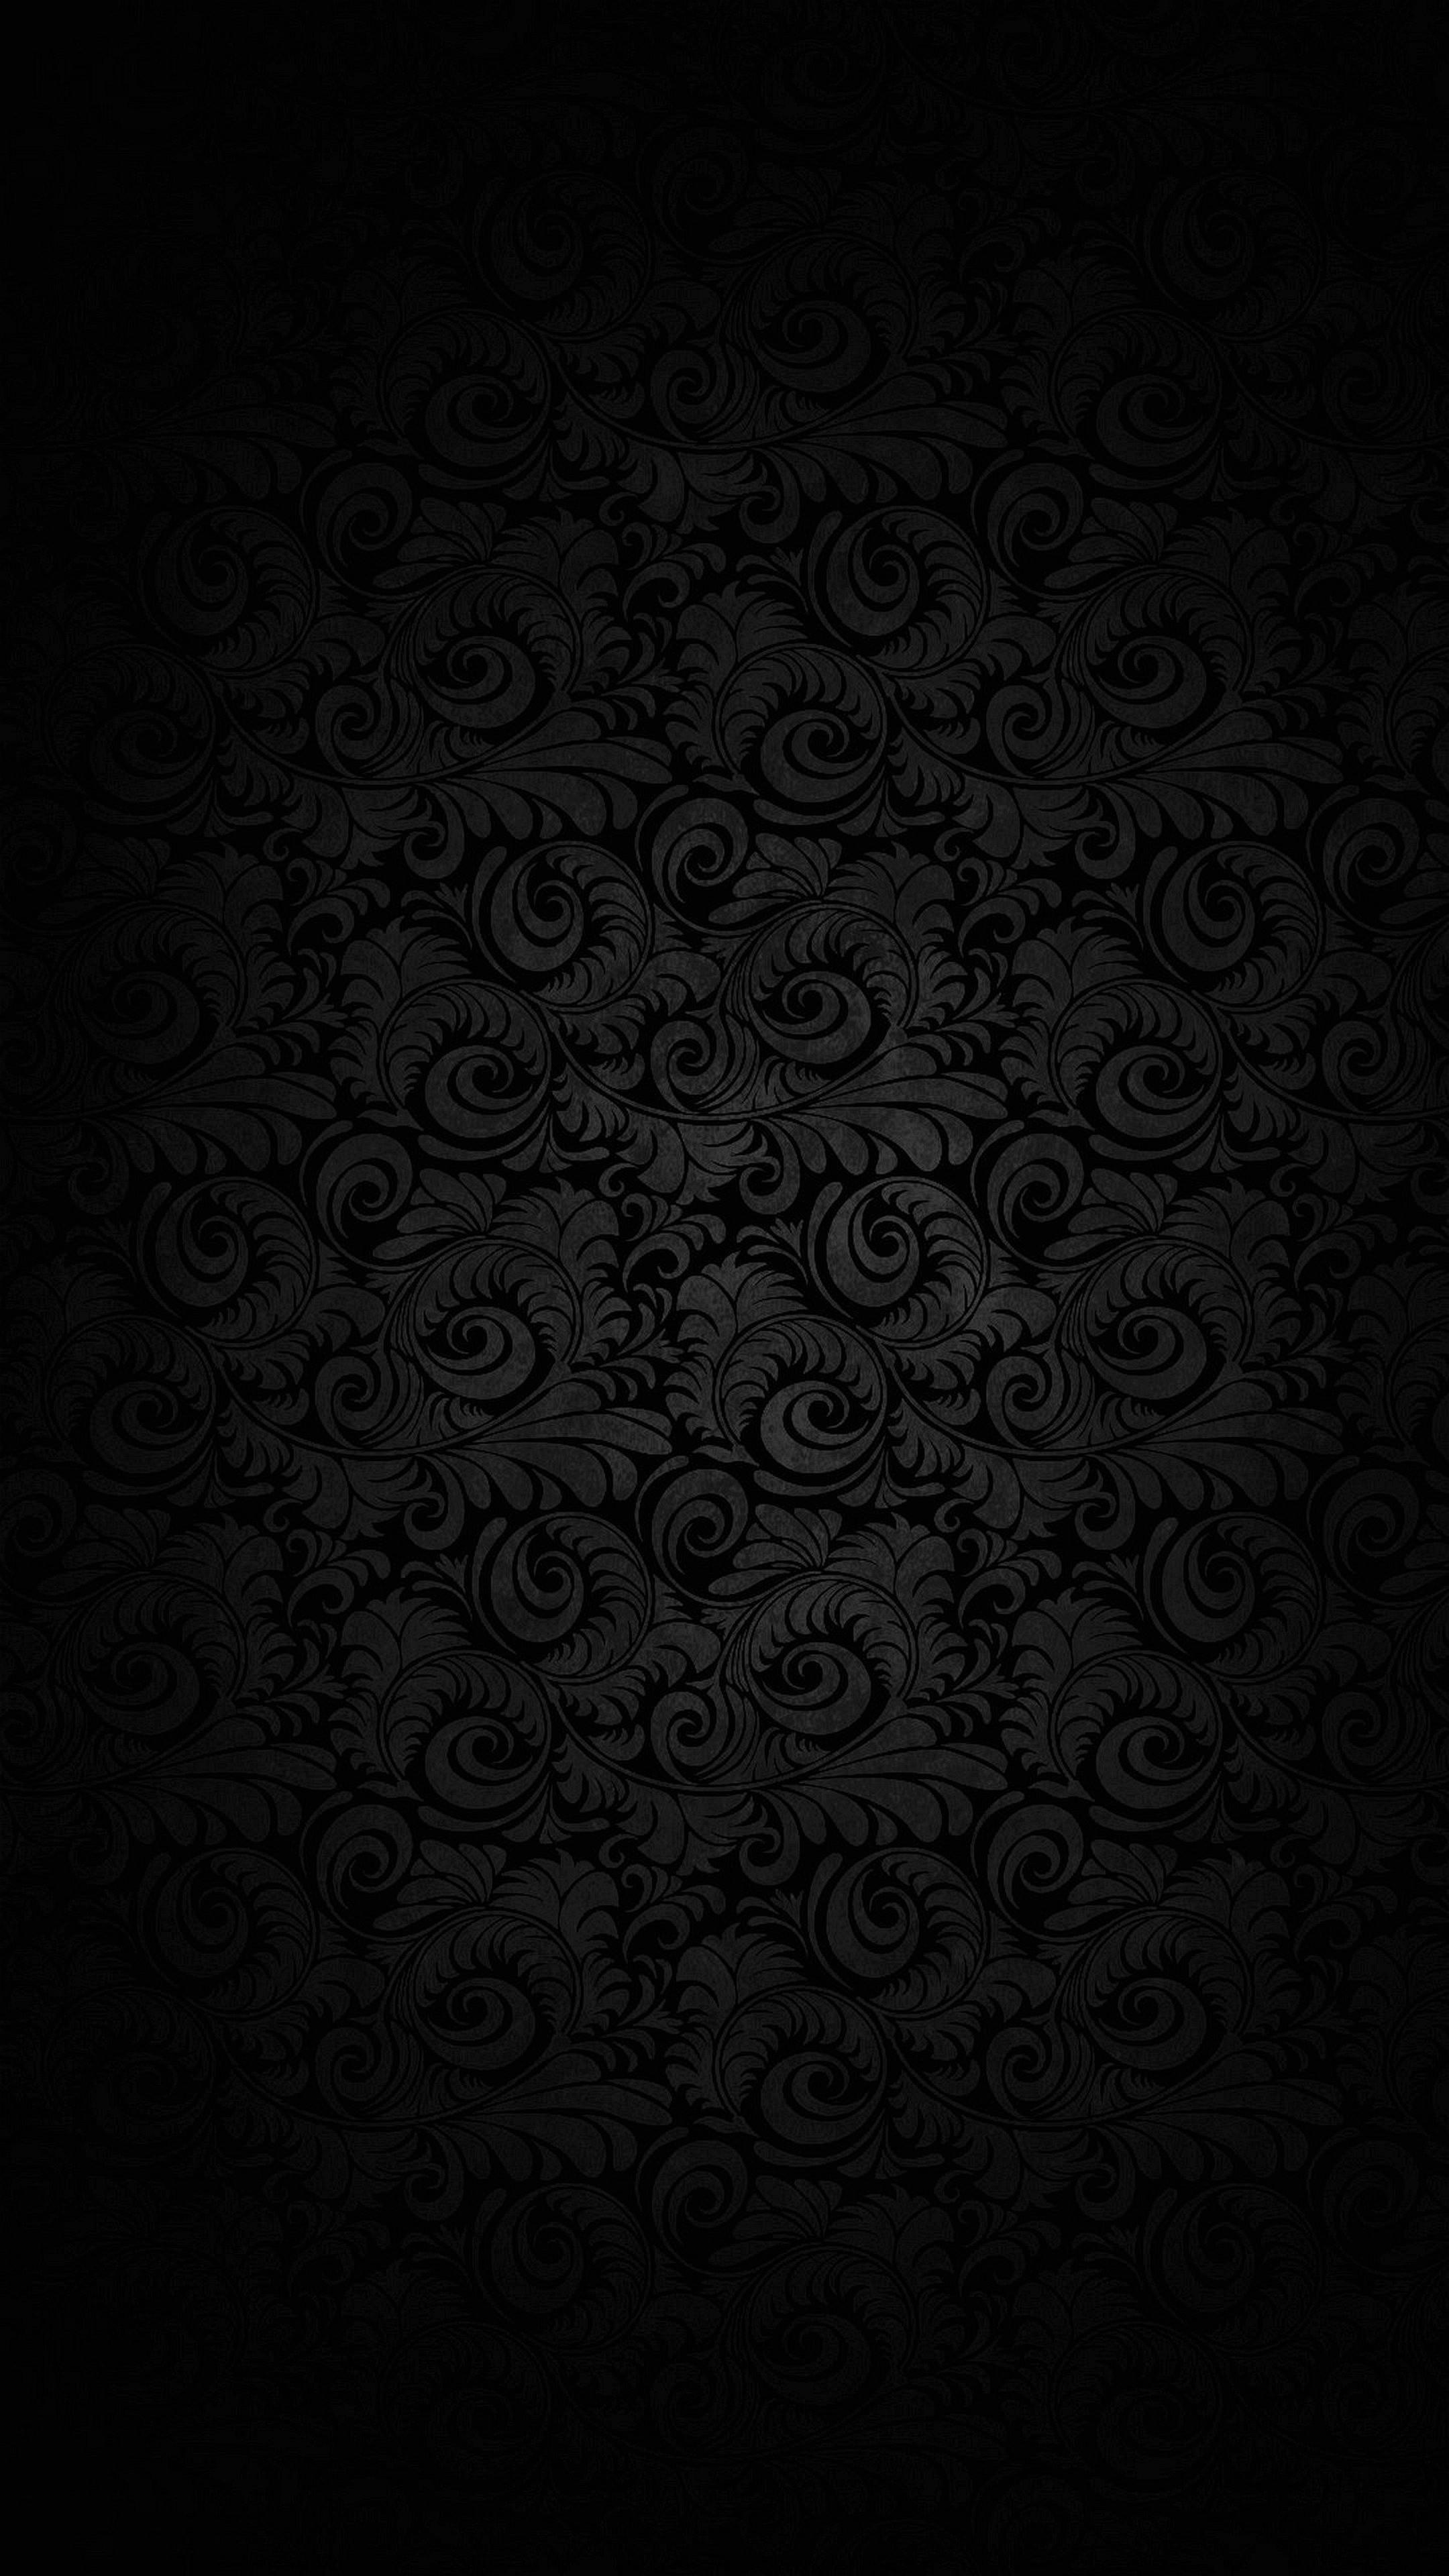 samsung galaxy note 5 type wallpaper for wallpaper n 1810 samsung 2160x3840